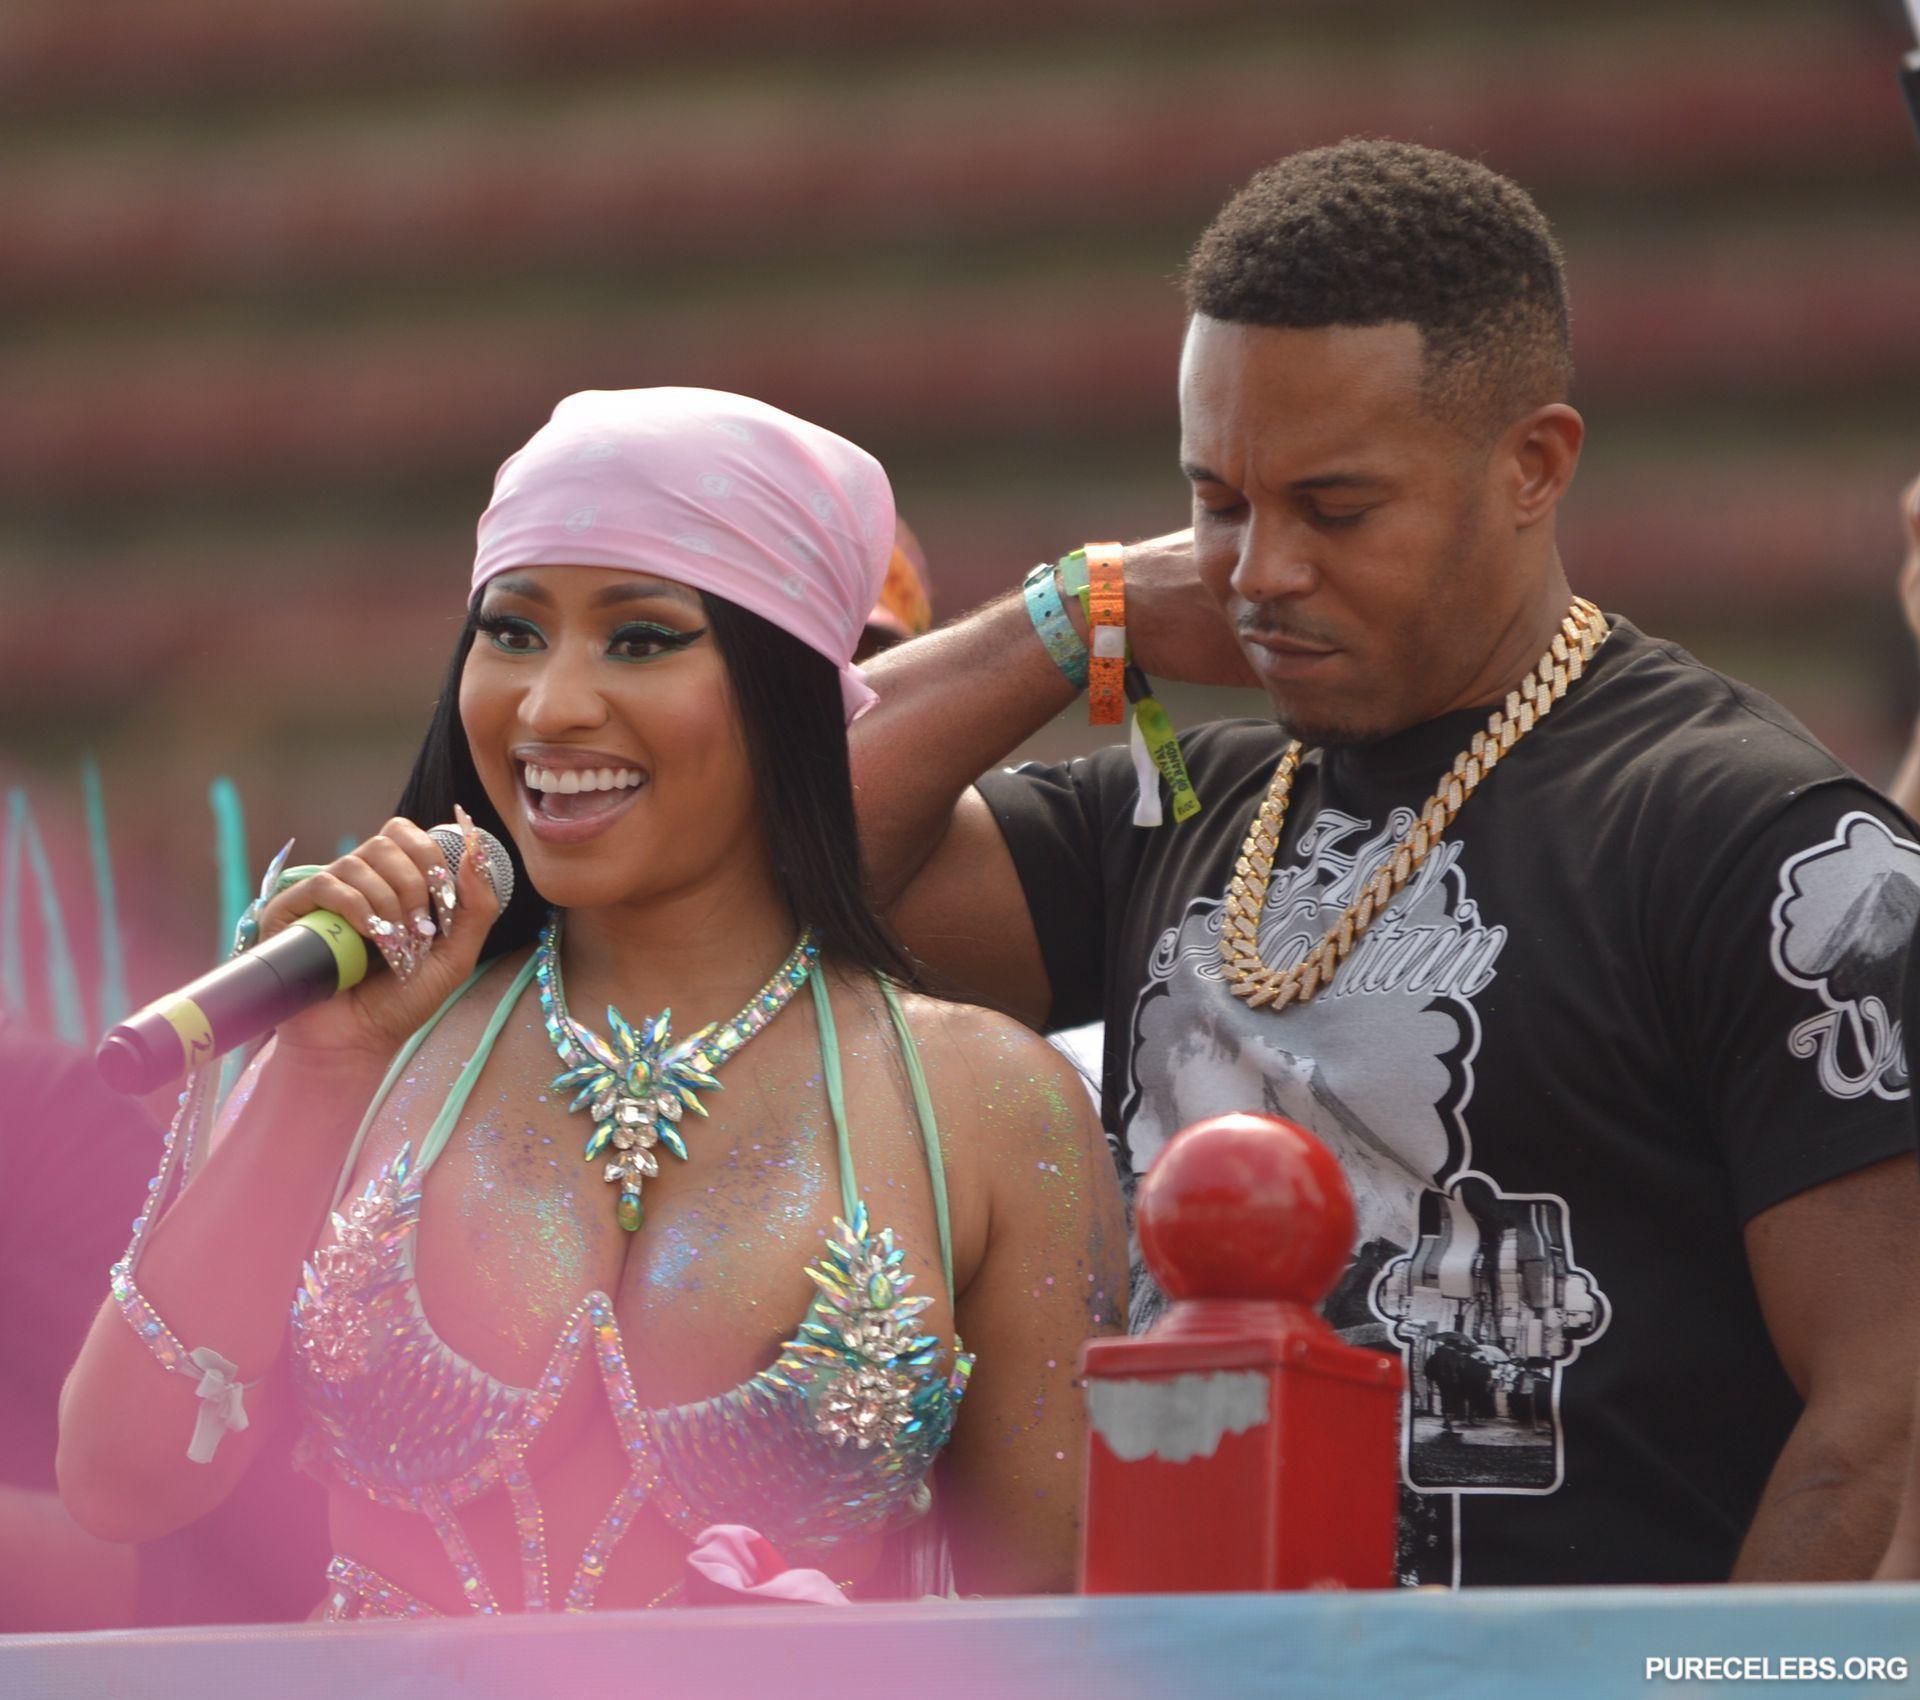 Nicki Minaj Dons an Eye-Catching and Mostly See-Through